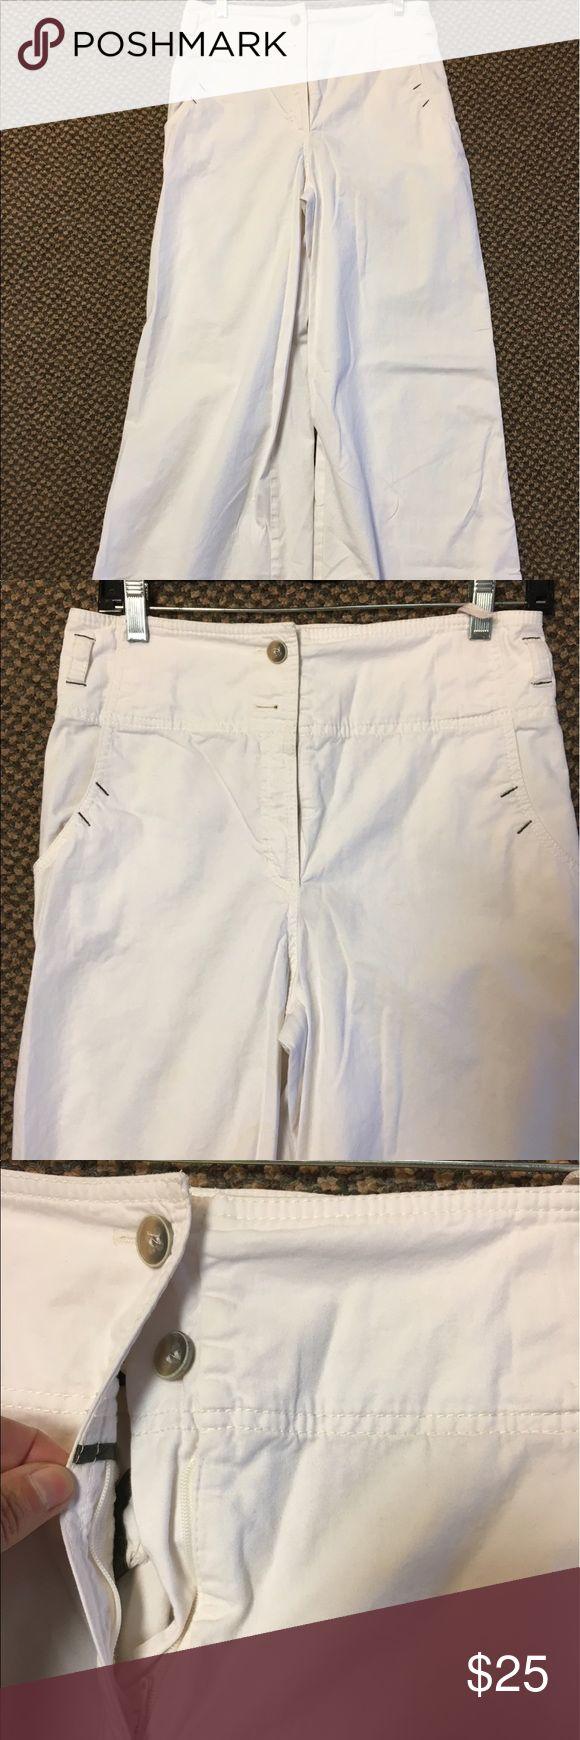 European Designer High Waist Wide Leg Cotton Pants Super trendy light-weight stretch cotton. Unlined. Contrast stitching at pockets. Wide leg. Super soft cotton blend. High waist. emozioni Pants Wide Leg